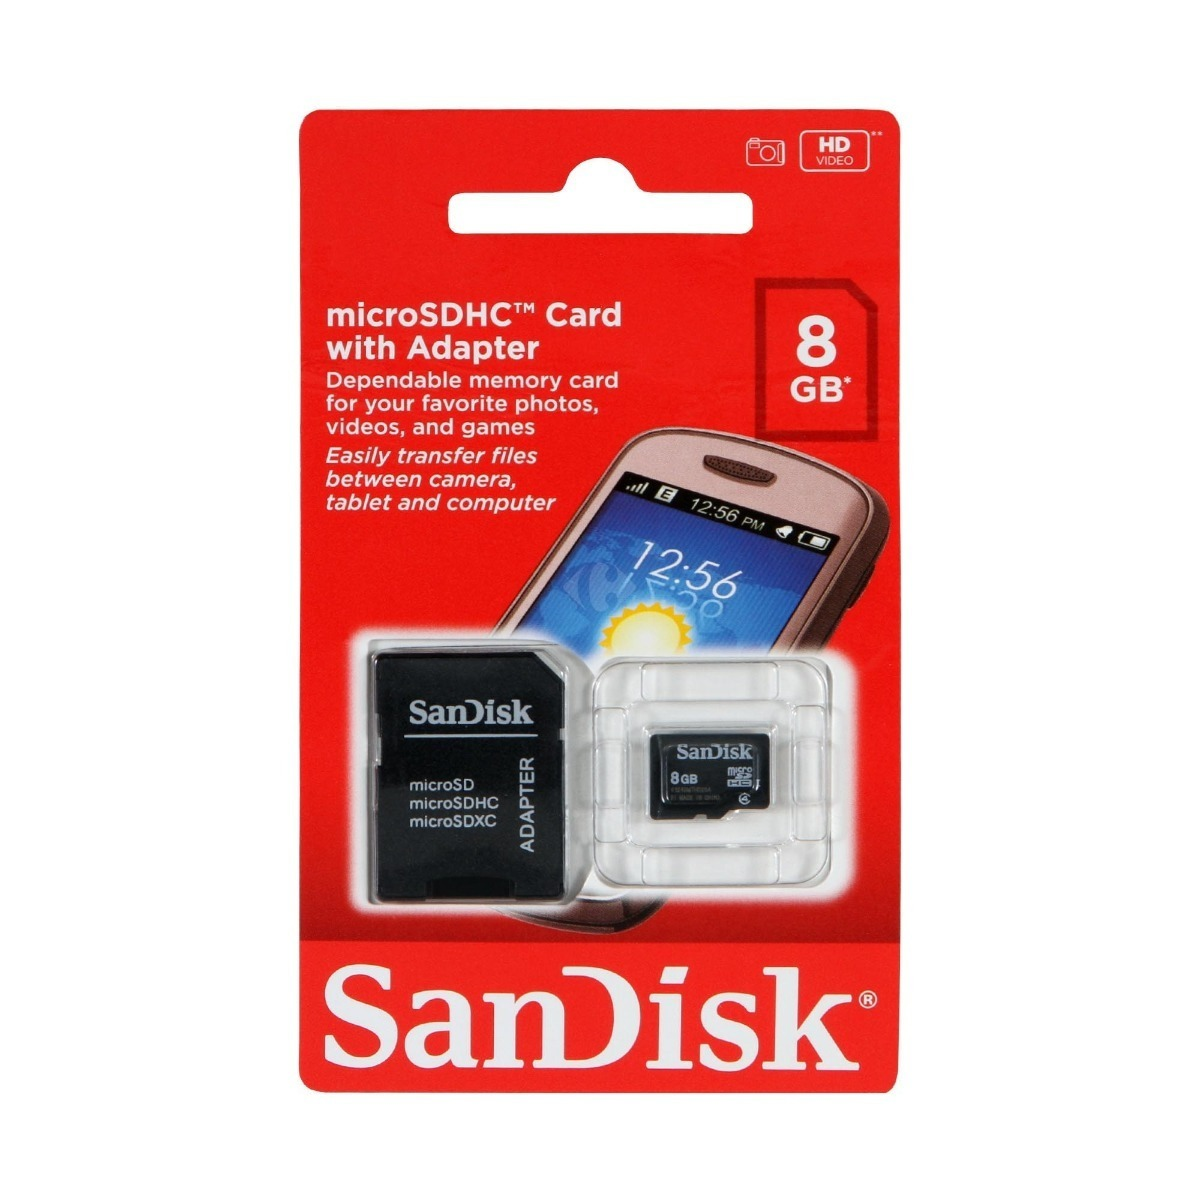 Memoria Micro Sd Sandisk 8gb Clase 4 Con Adaptador Original